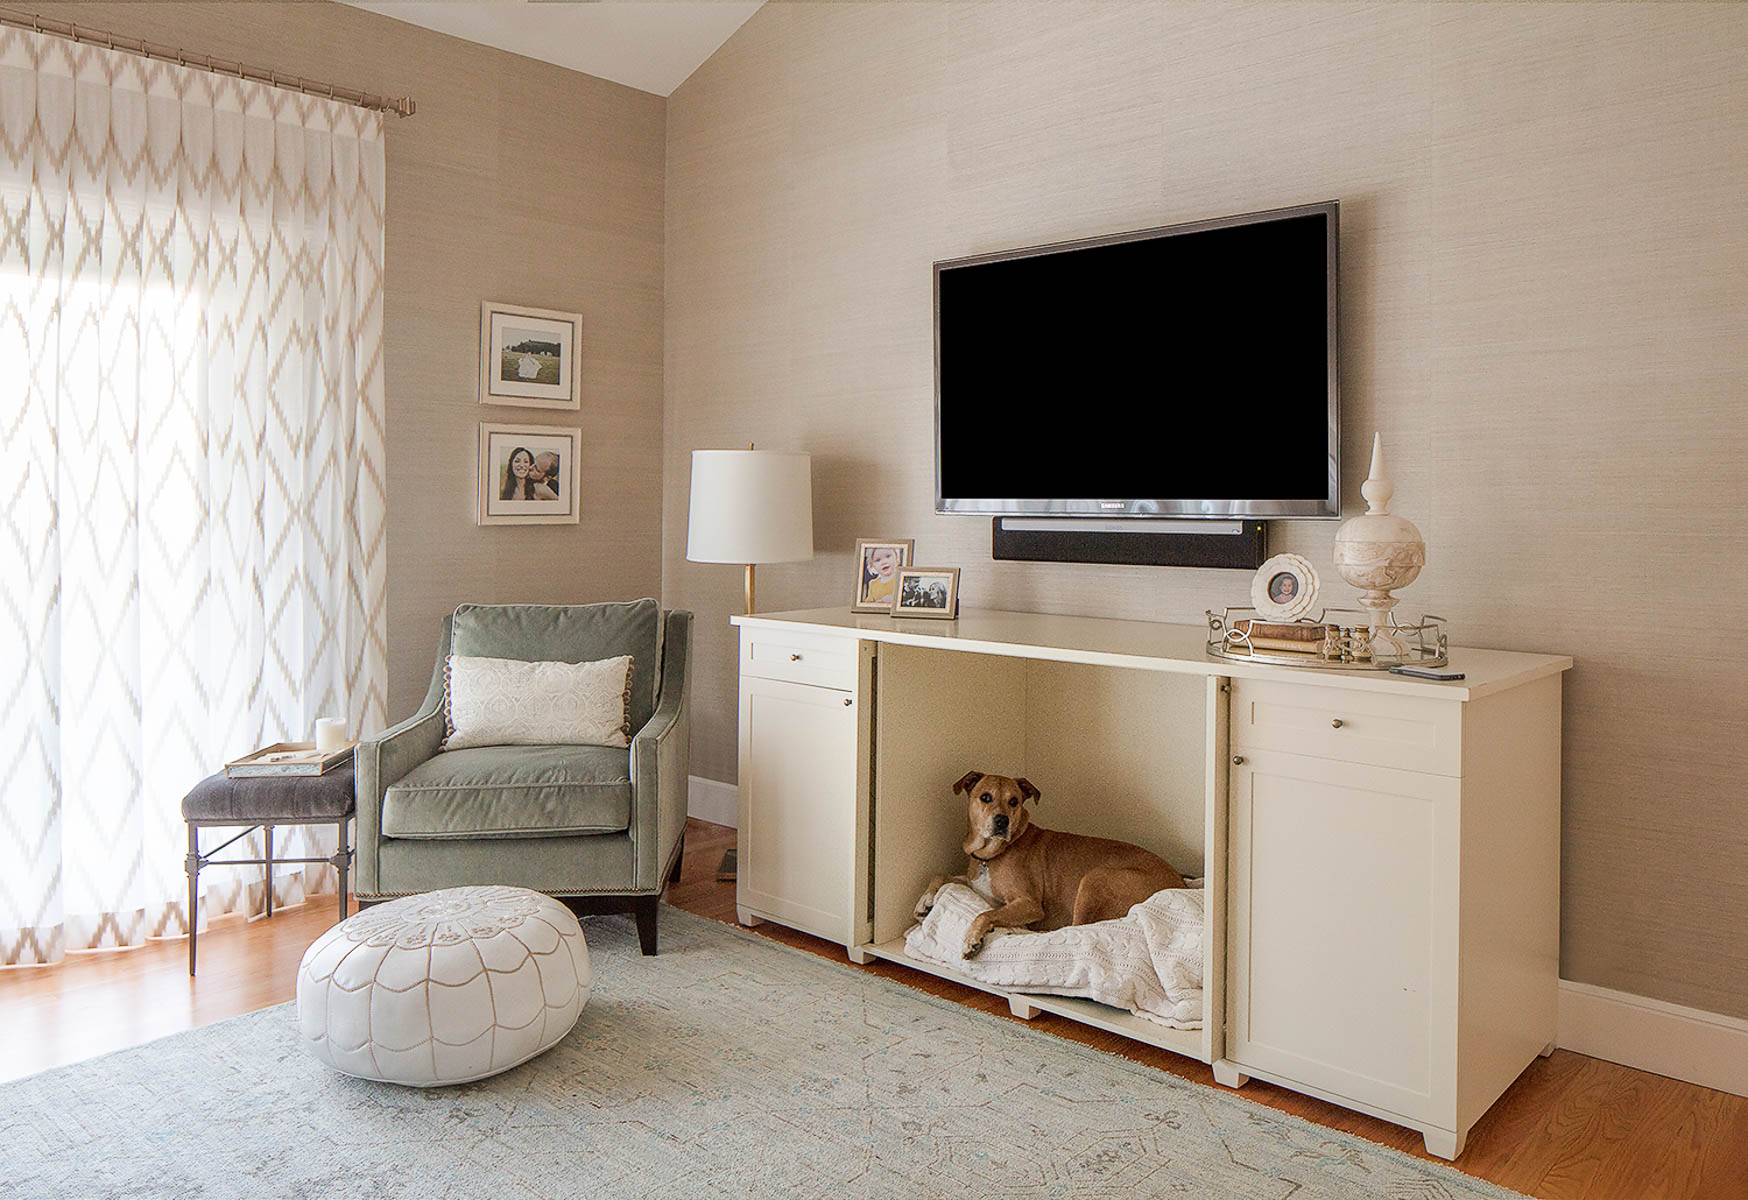 11 Hillsborough_After_BR cabinet w dog Web-16